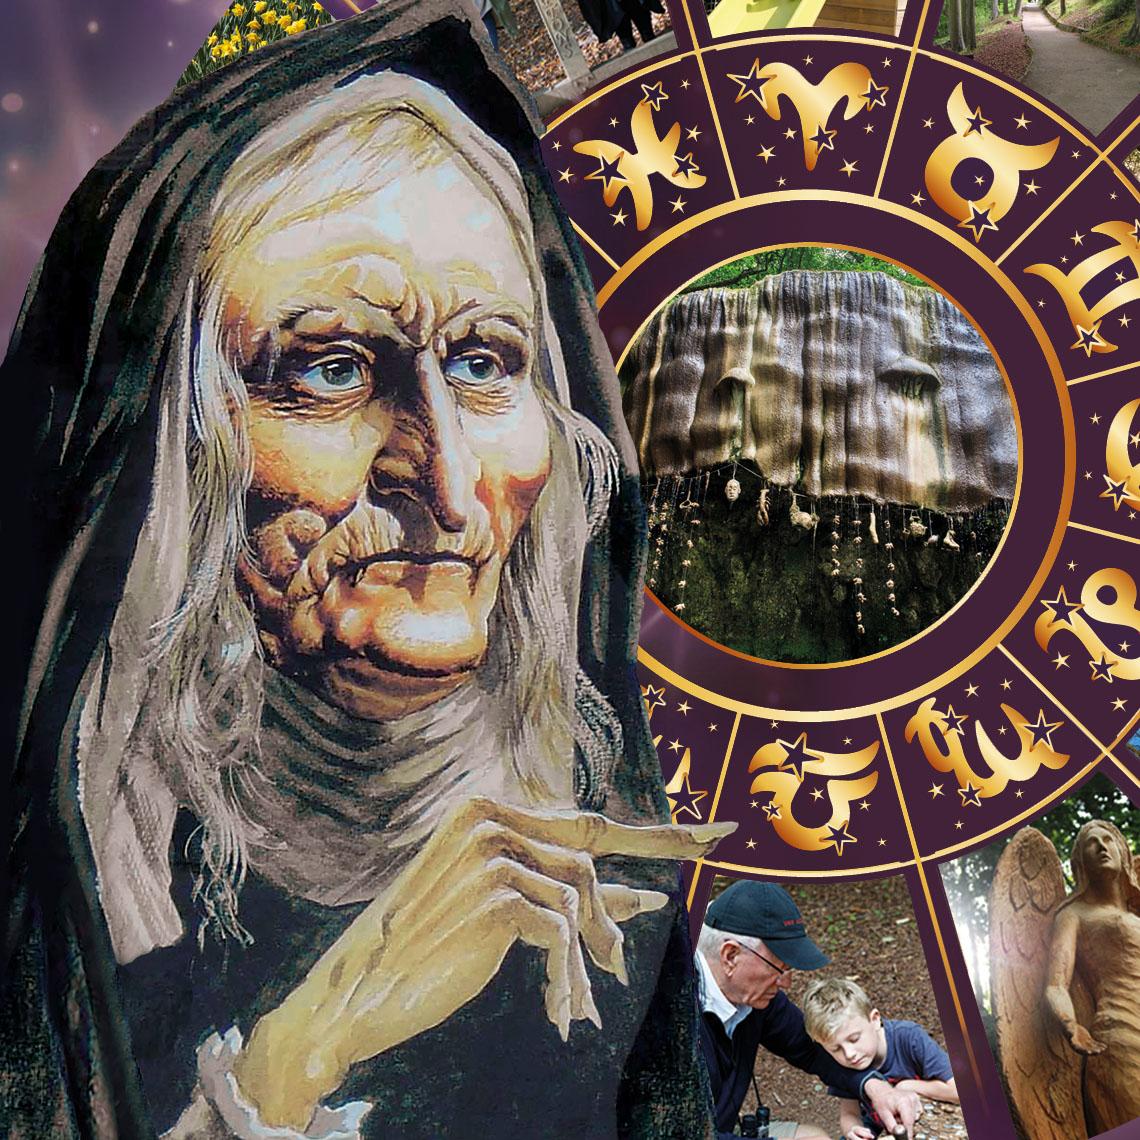 2018 Leaflet RGB image - Nostradamus'u Gölgede Bırakan Kahin: Shipton ANA